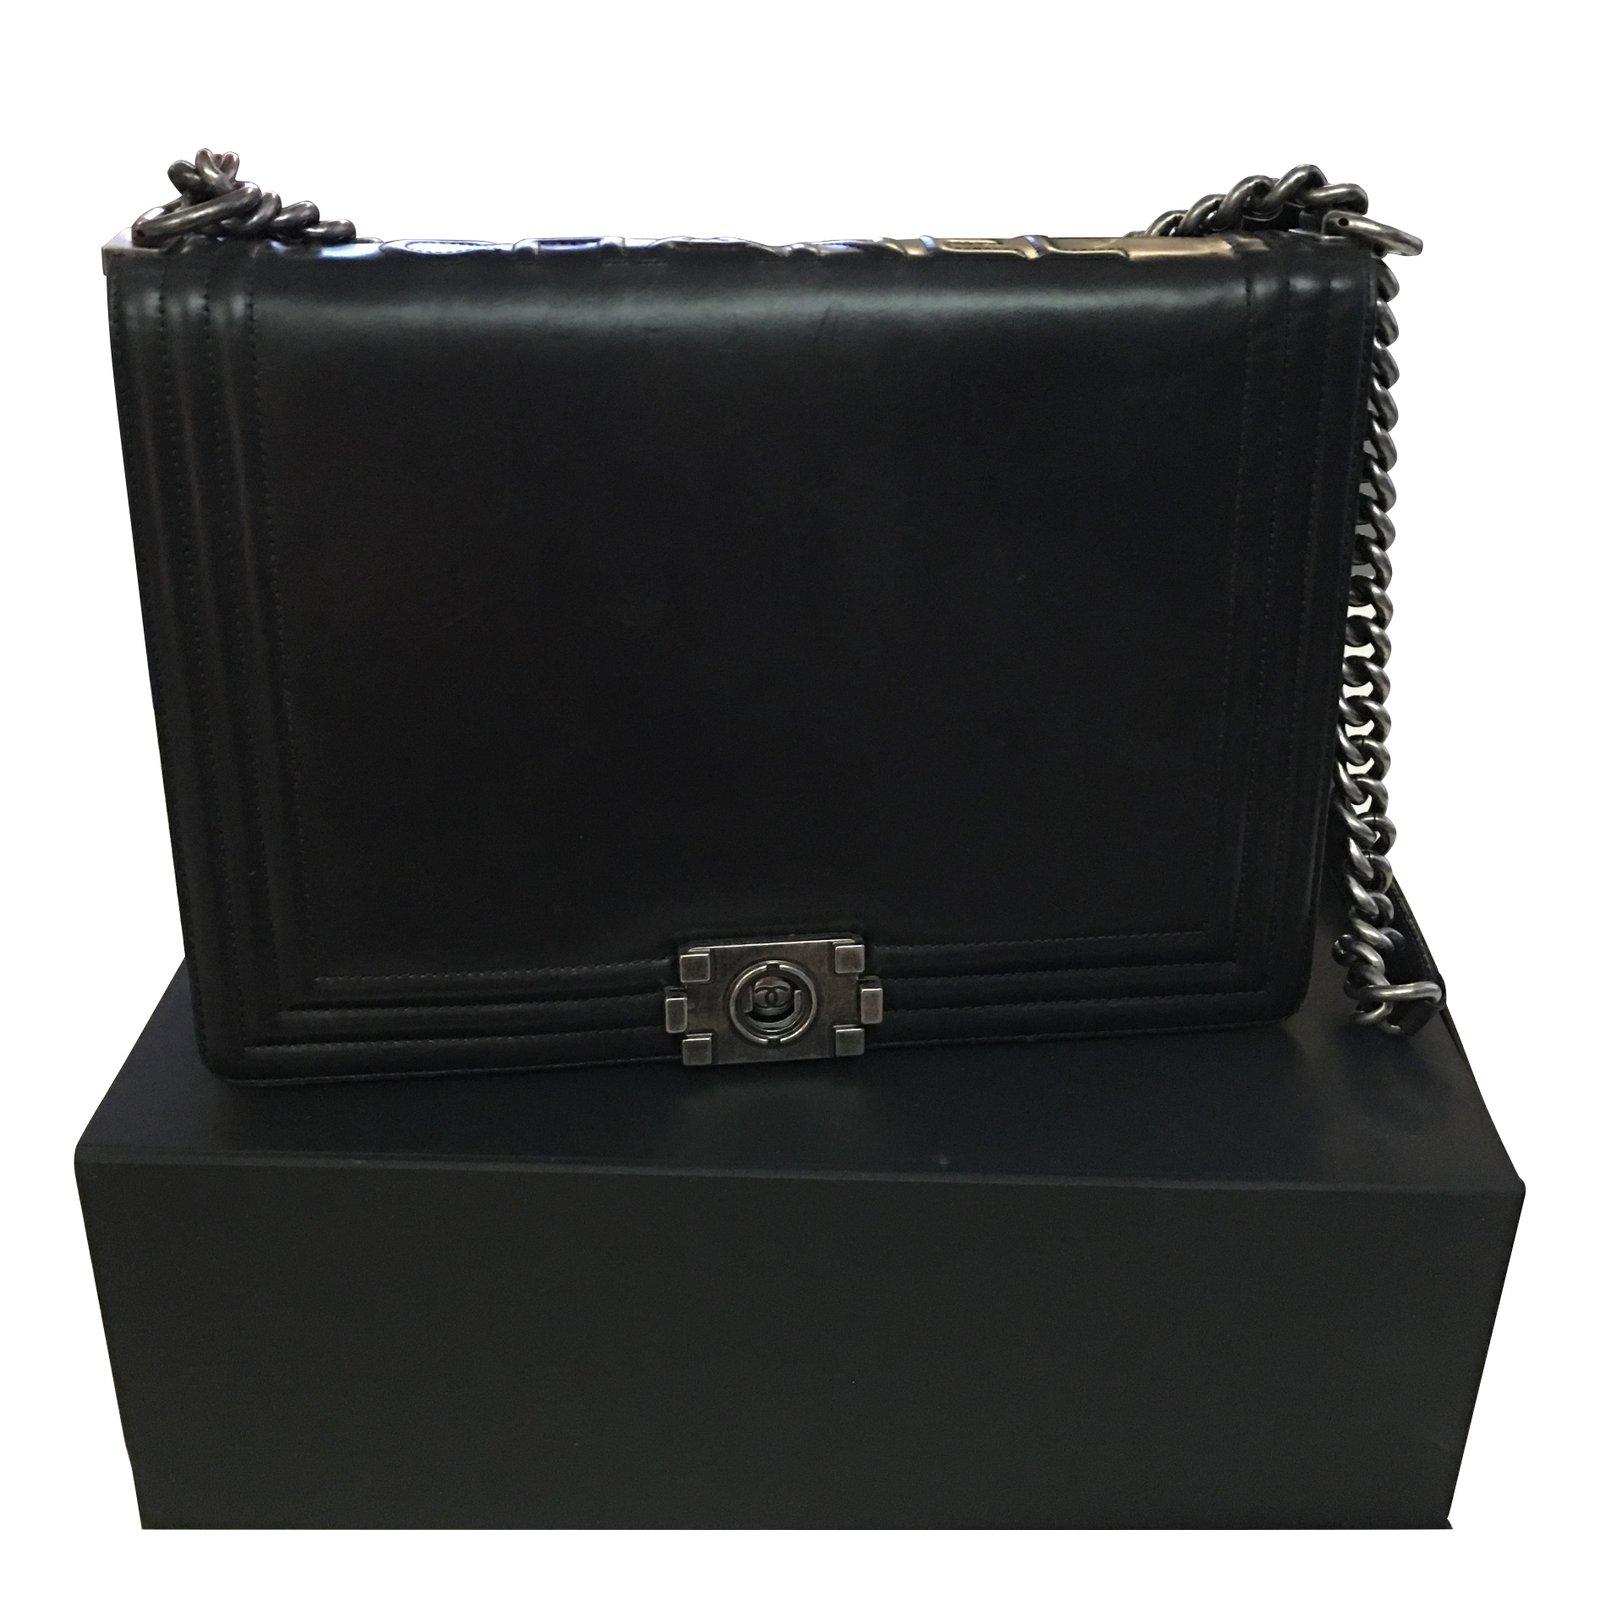 Sacs à main Chanel Boy grand modèle Cuir Noir ref.11011 - Joli Closet 7ca13e9127d5